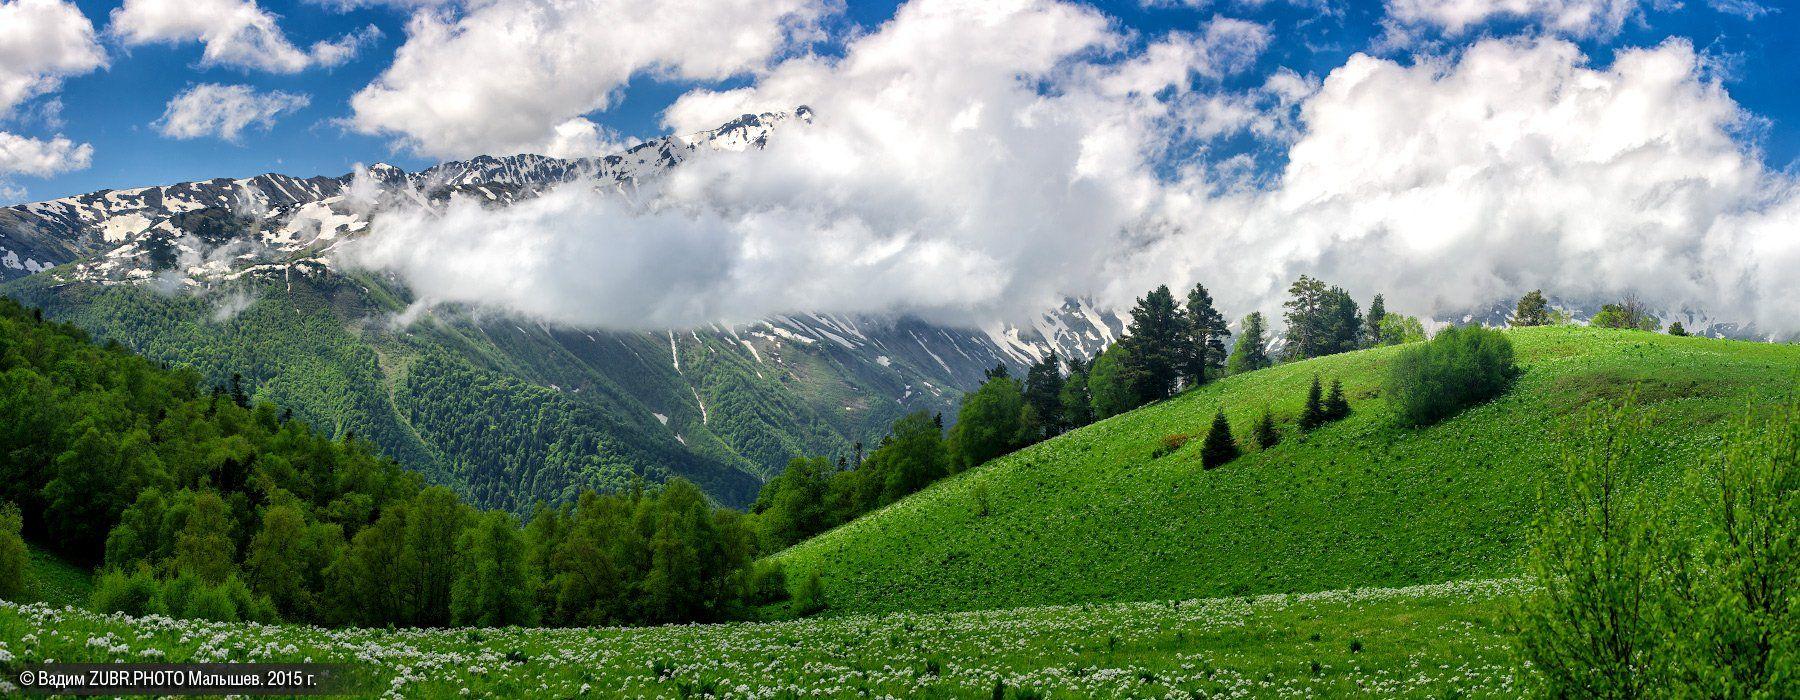 панорама, пейзаж, горы, заповедник, лето, облака, zubrphoto, Абаго, Кавказ, Вадим ZUBR Малышев